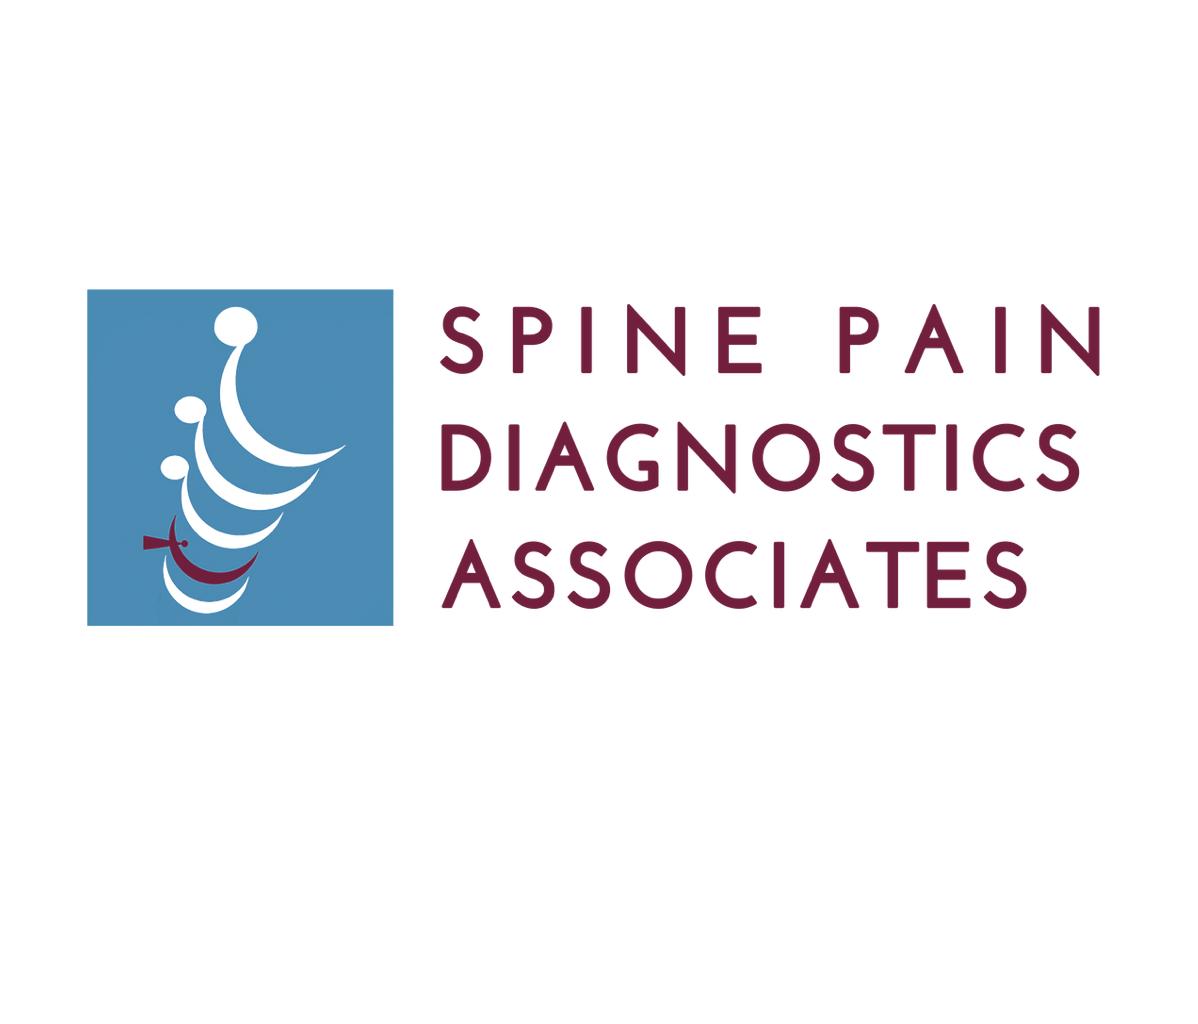 Spine Pain Diagnostics Associates - Racine